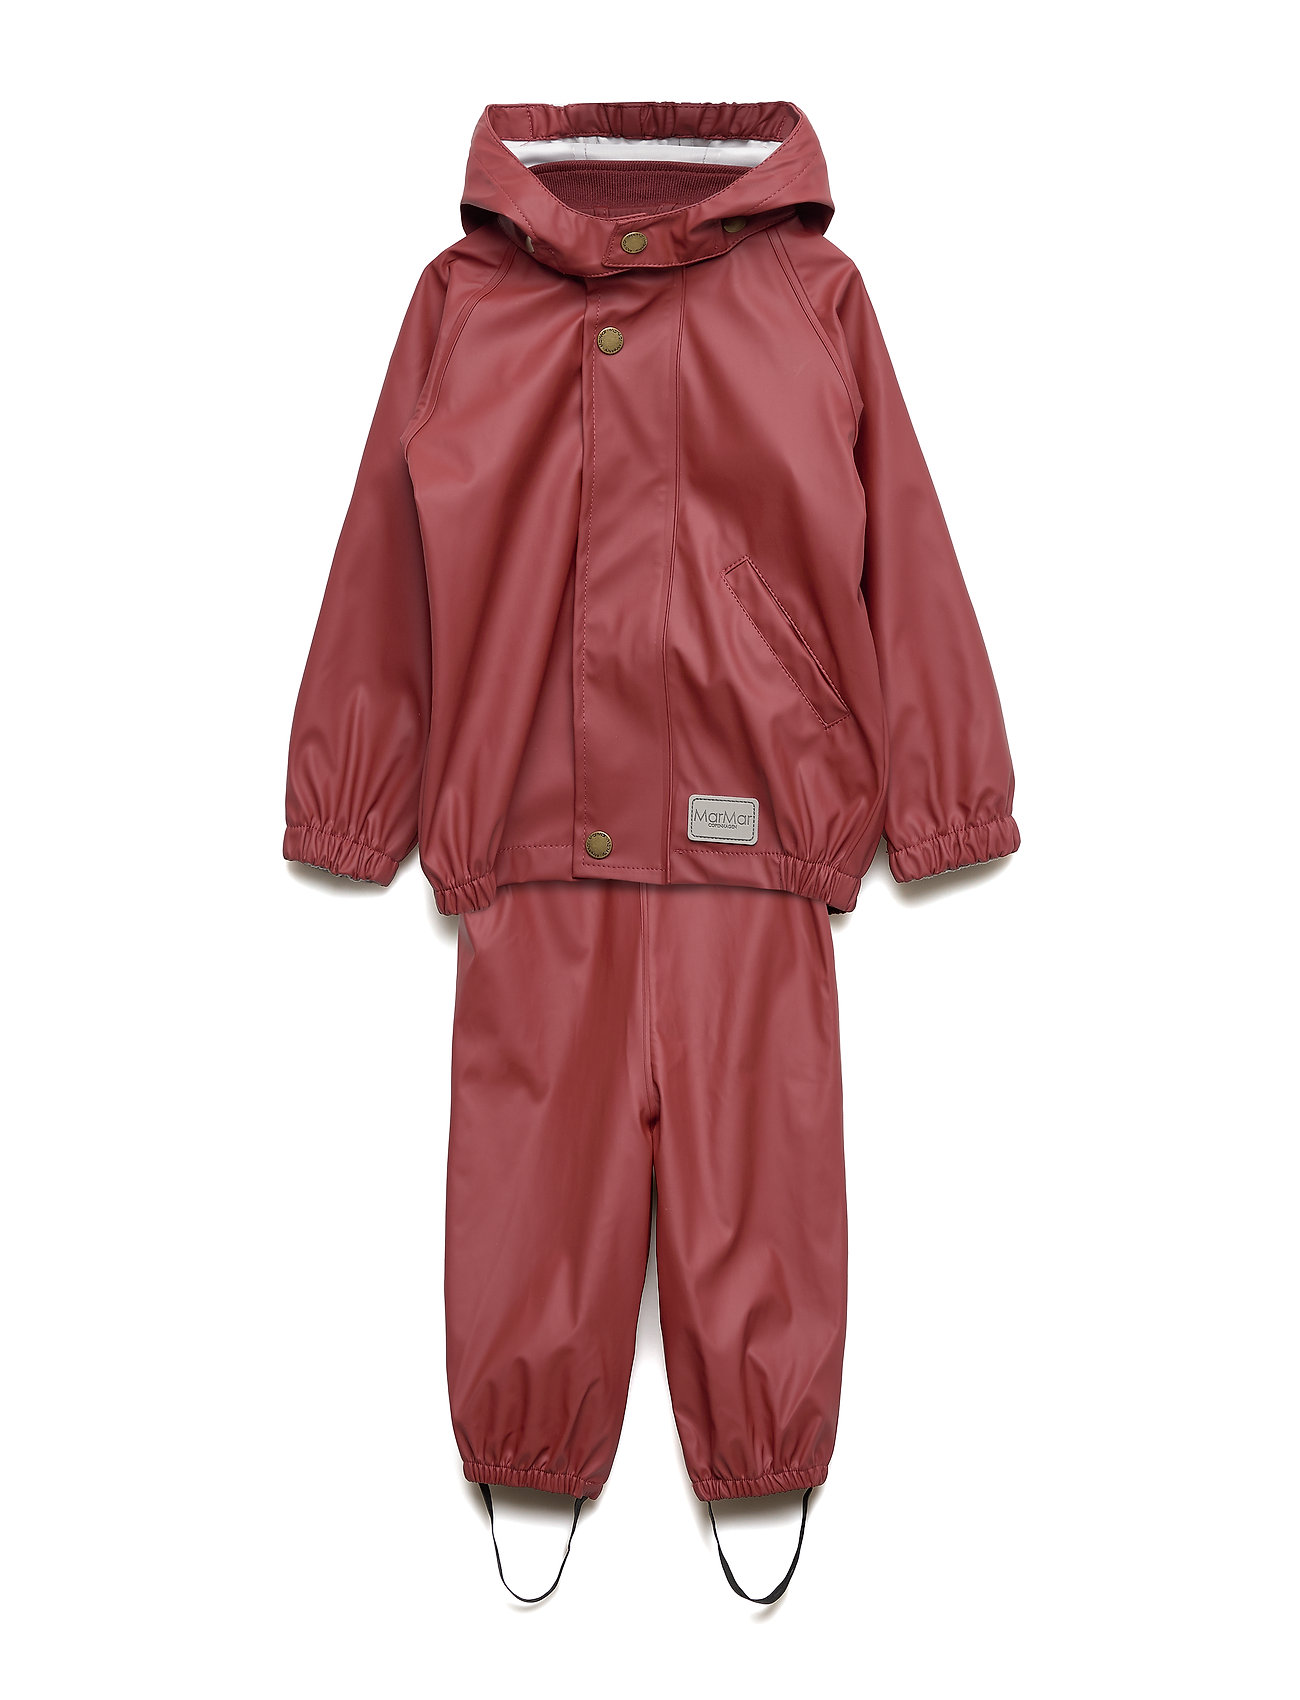 MarMar Cph Rainwear Set Baby - WINE